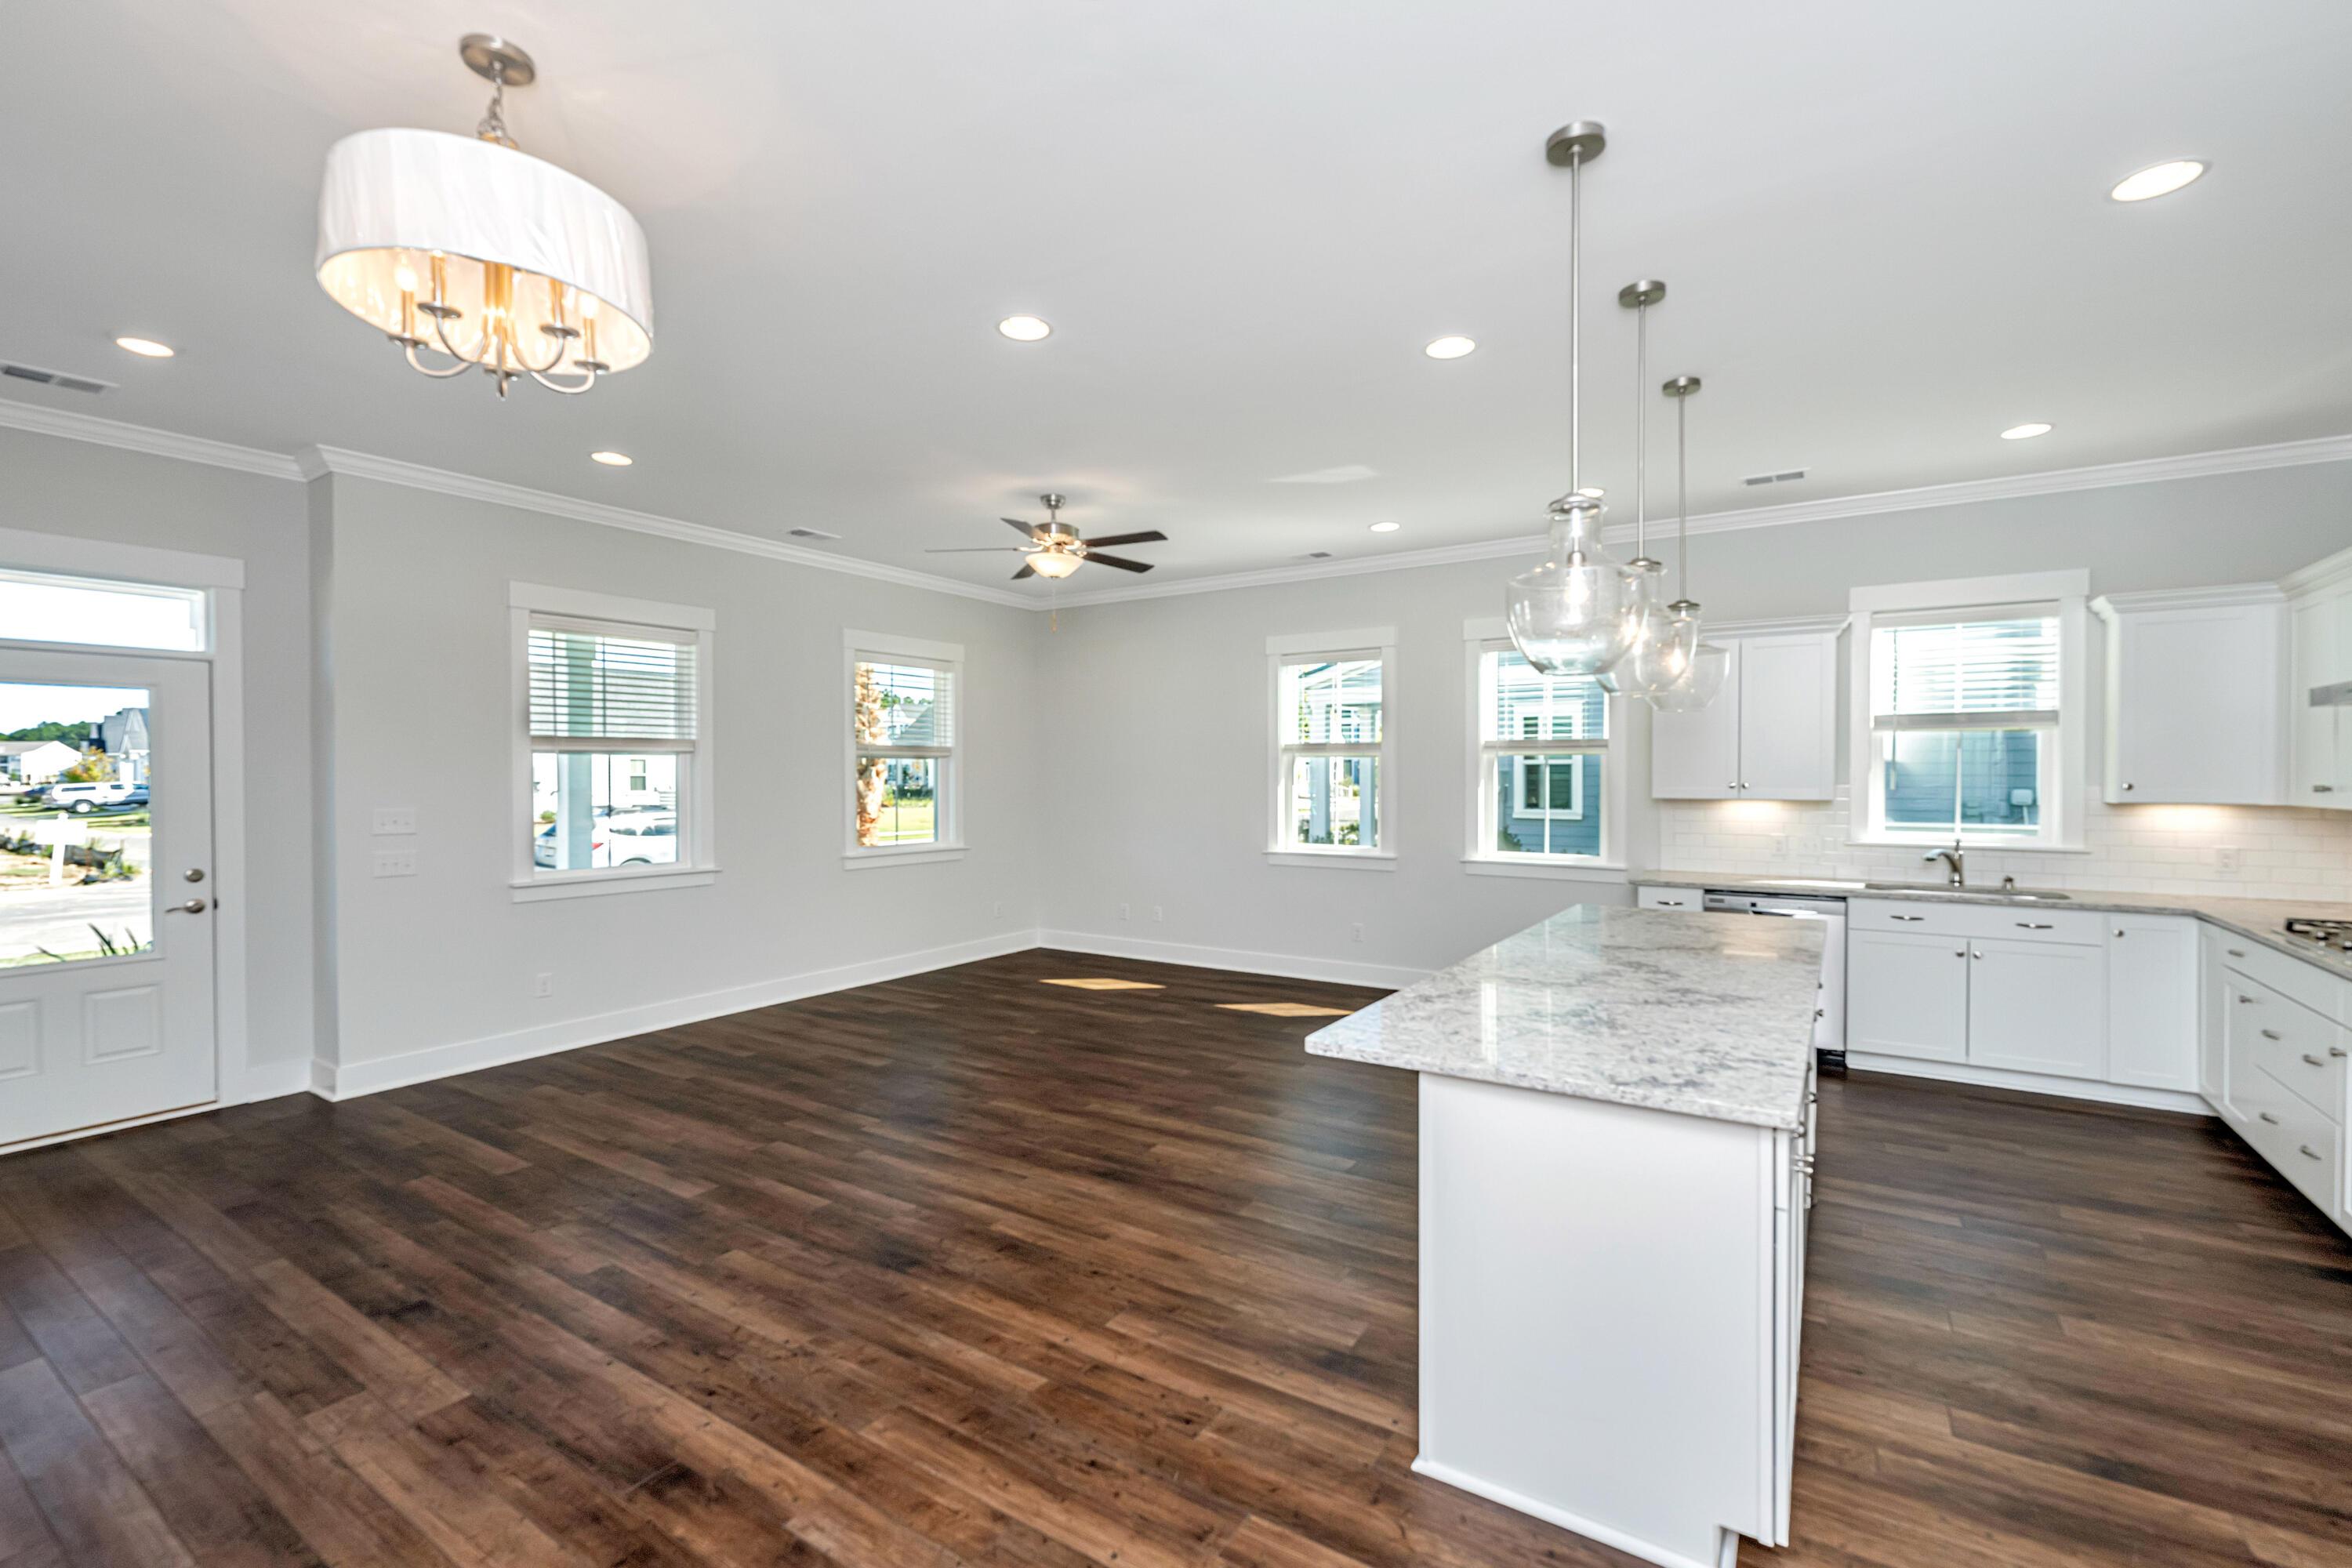 Carolina Park Homes For Sale - 1513 Pogonia, Mount Pleasant, SC - 29